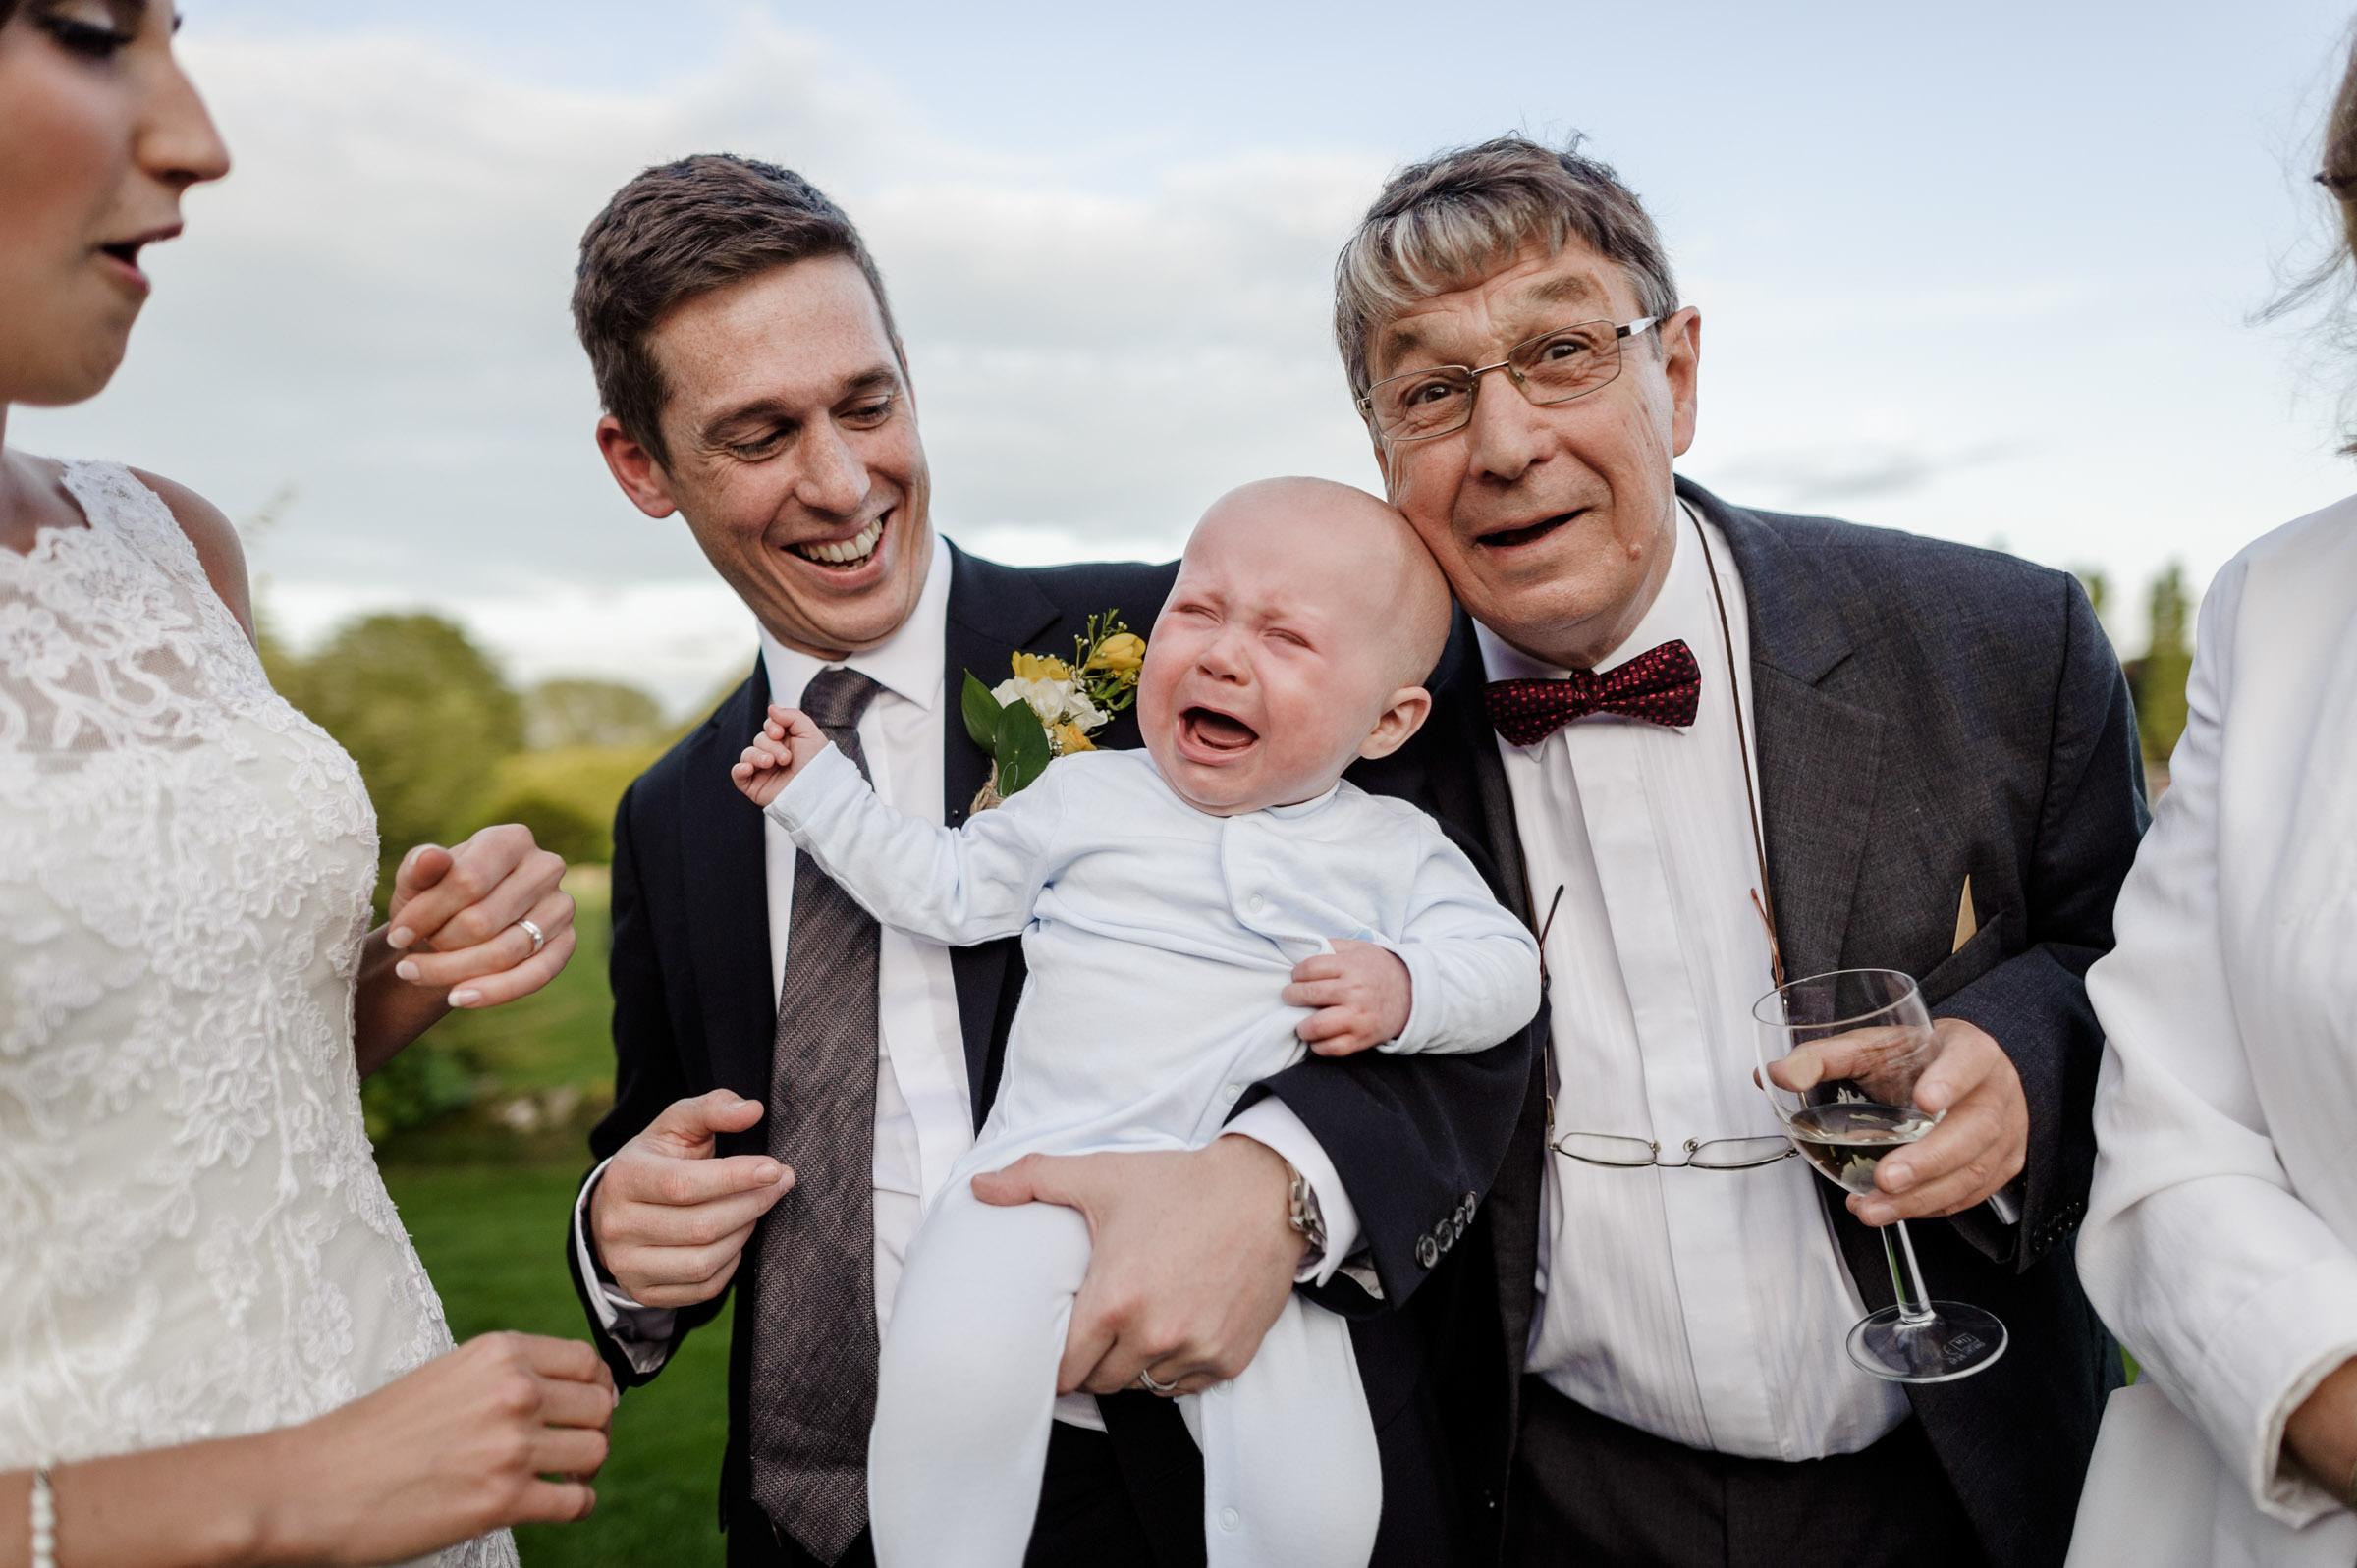 Notley Tythe Barn Reportage Wedding Photos 036.jpg